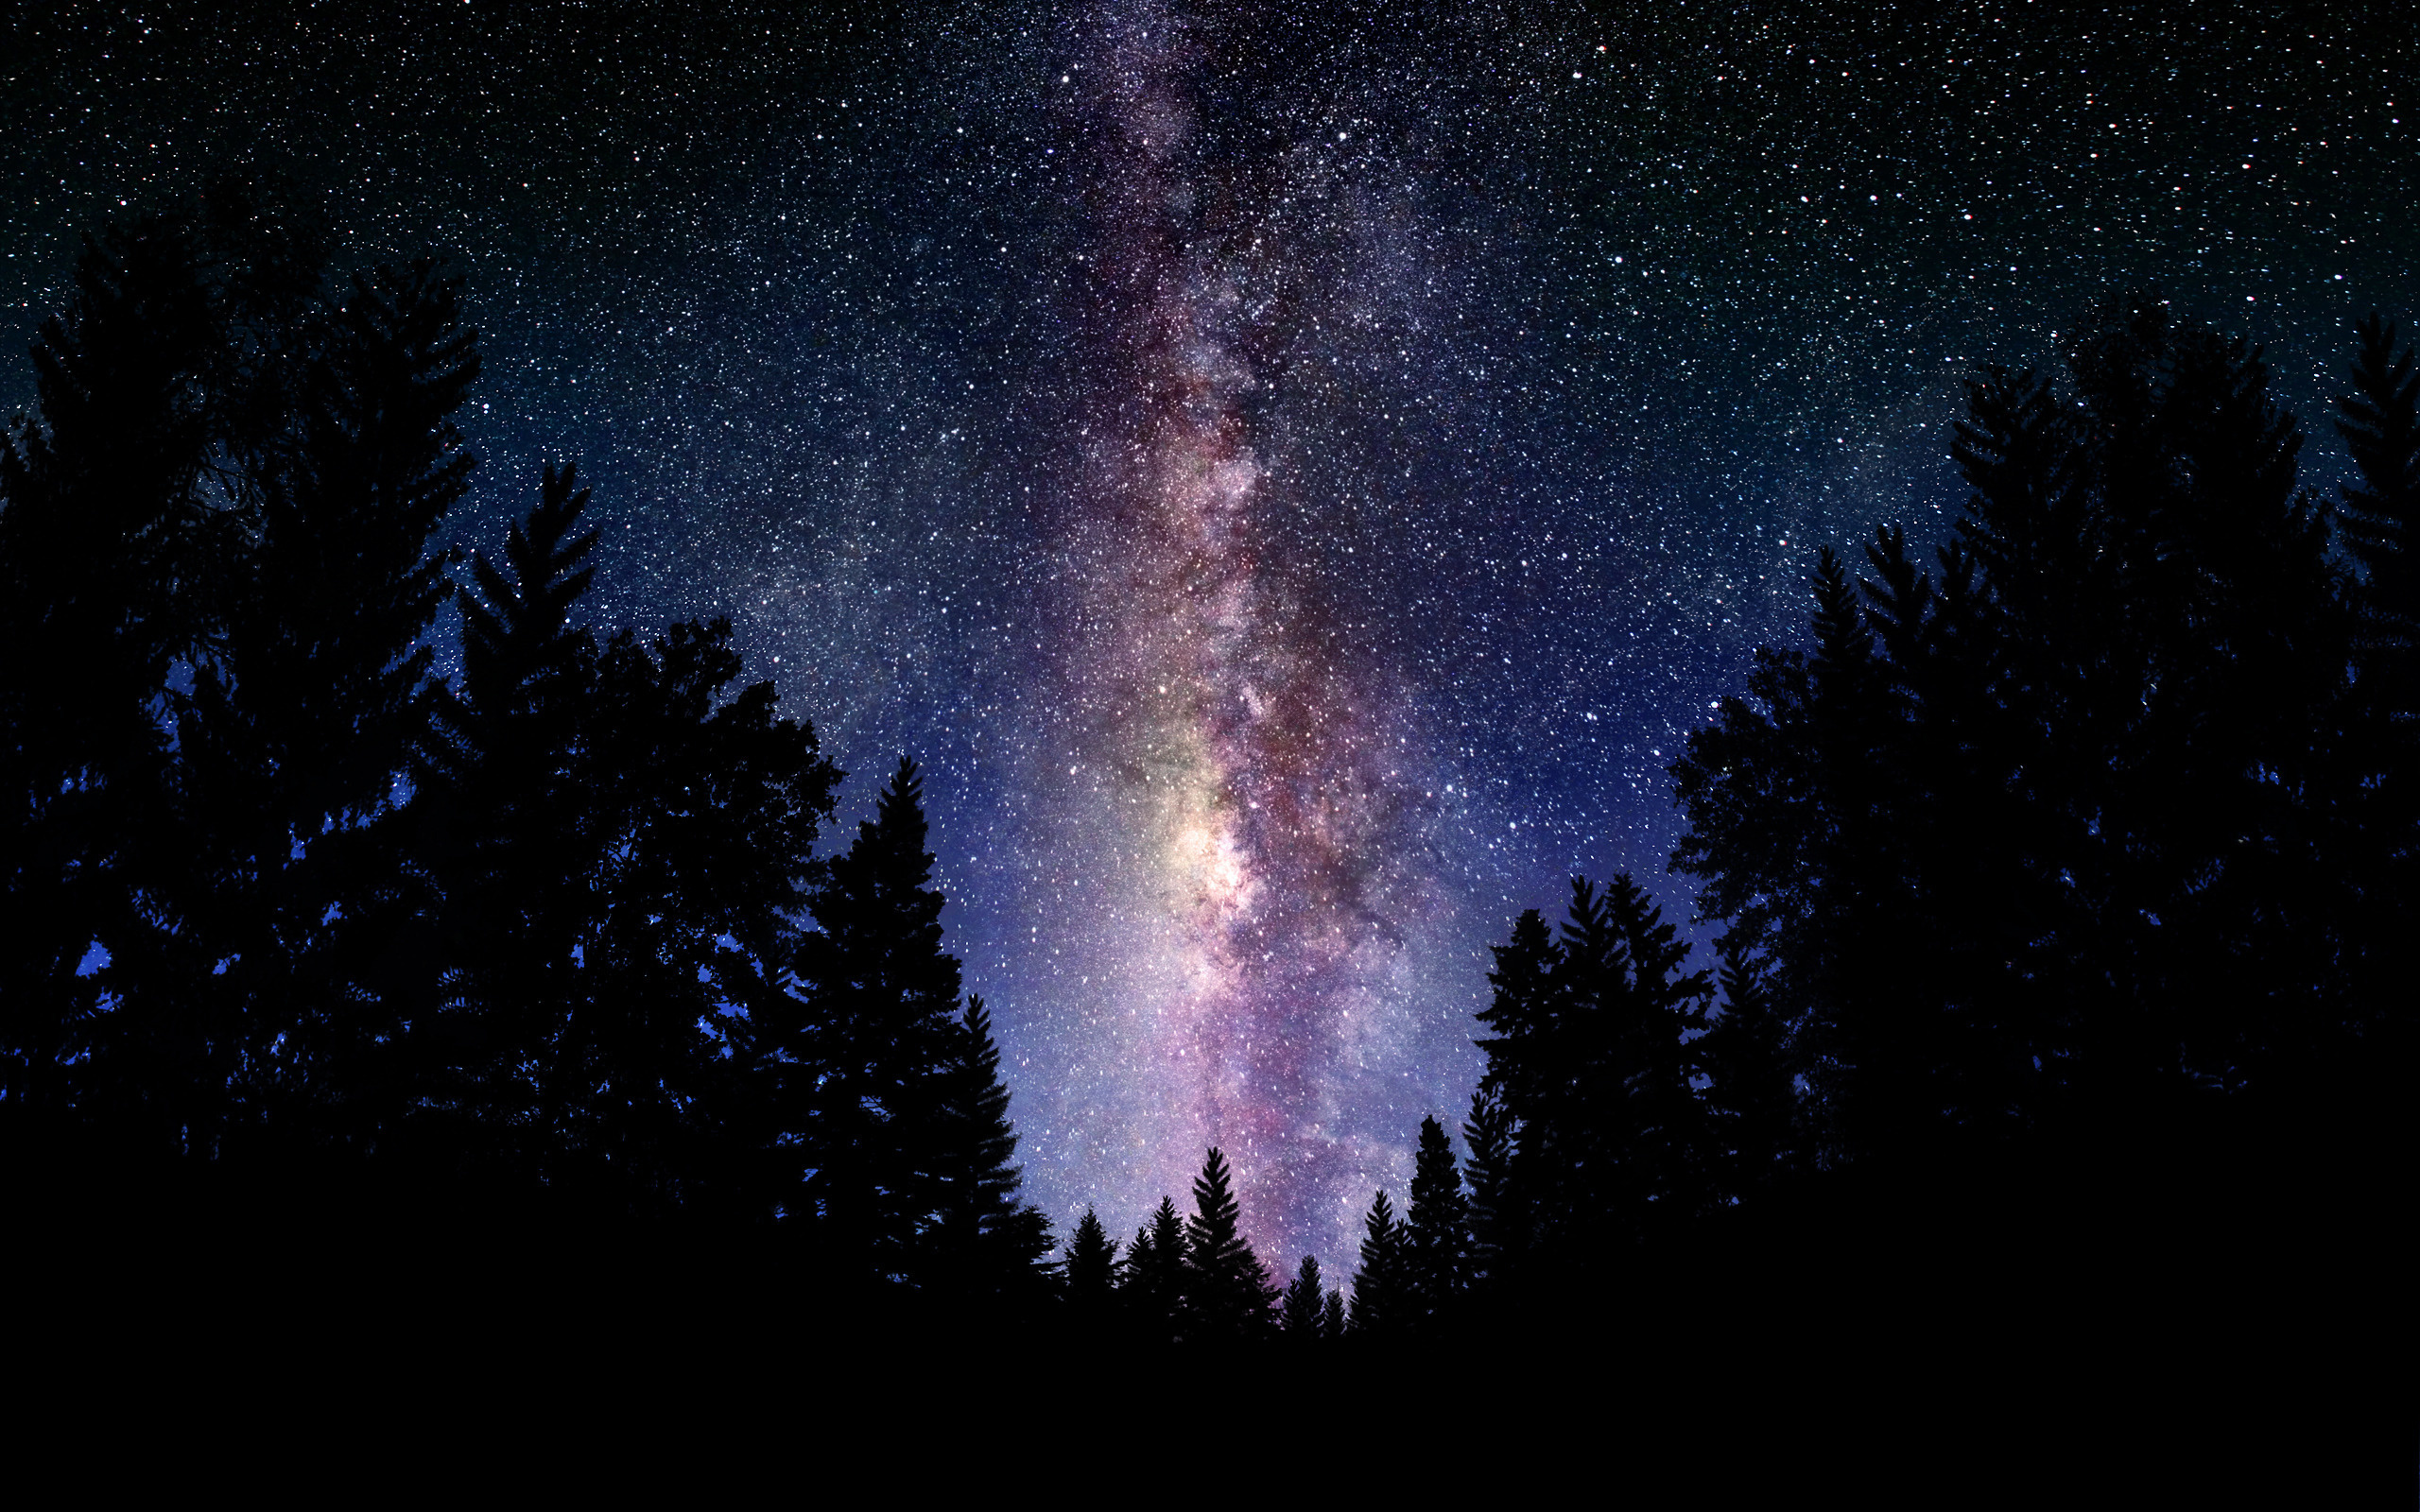 Wallpaper Milky Way sky night stars tree forest desktop wallpaper 2560x1600